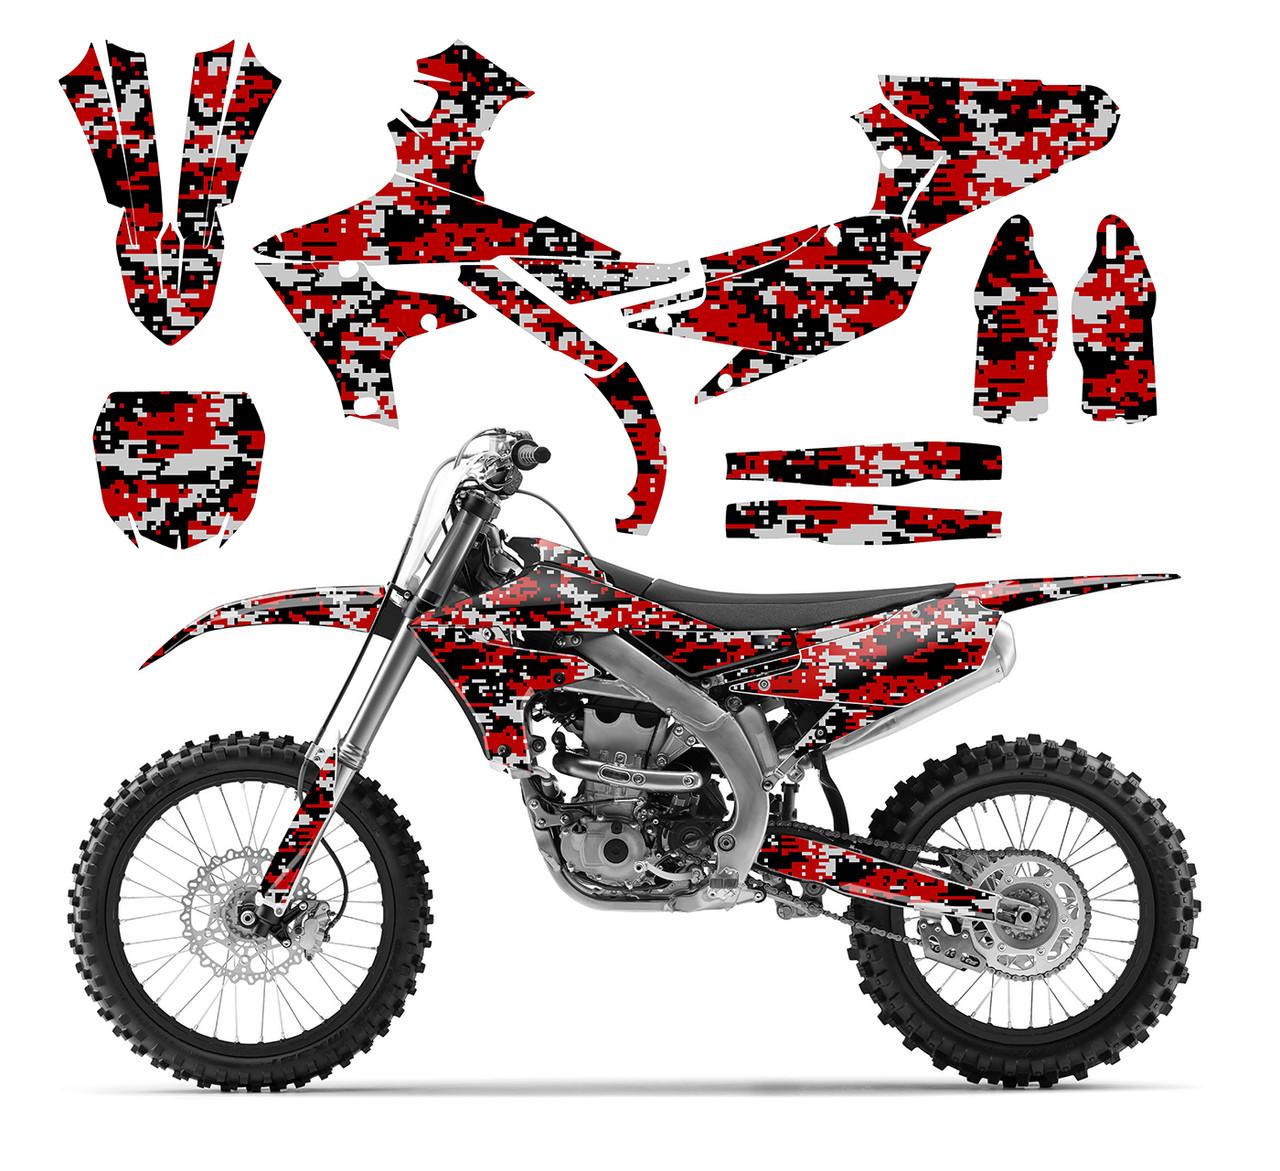 Red Digital Camo graphics sticker kit for 2019 Yamaha YZ450F, YZ250F